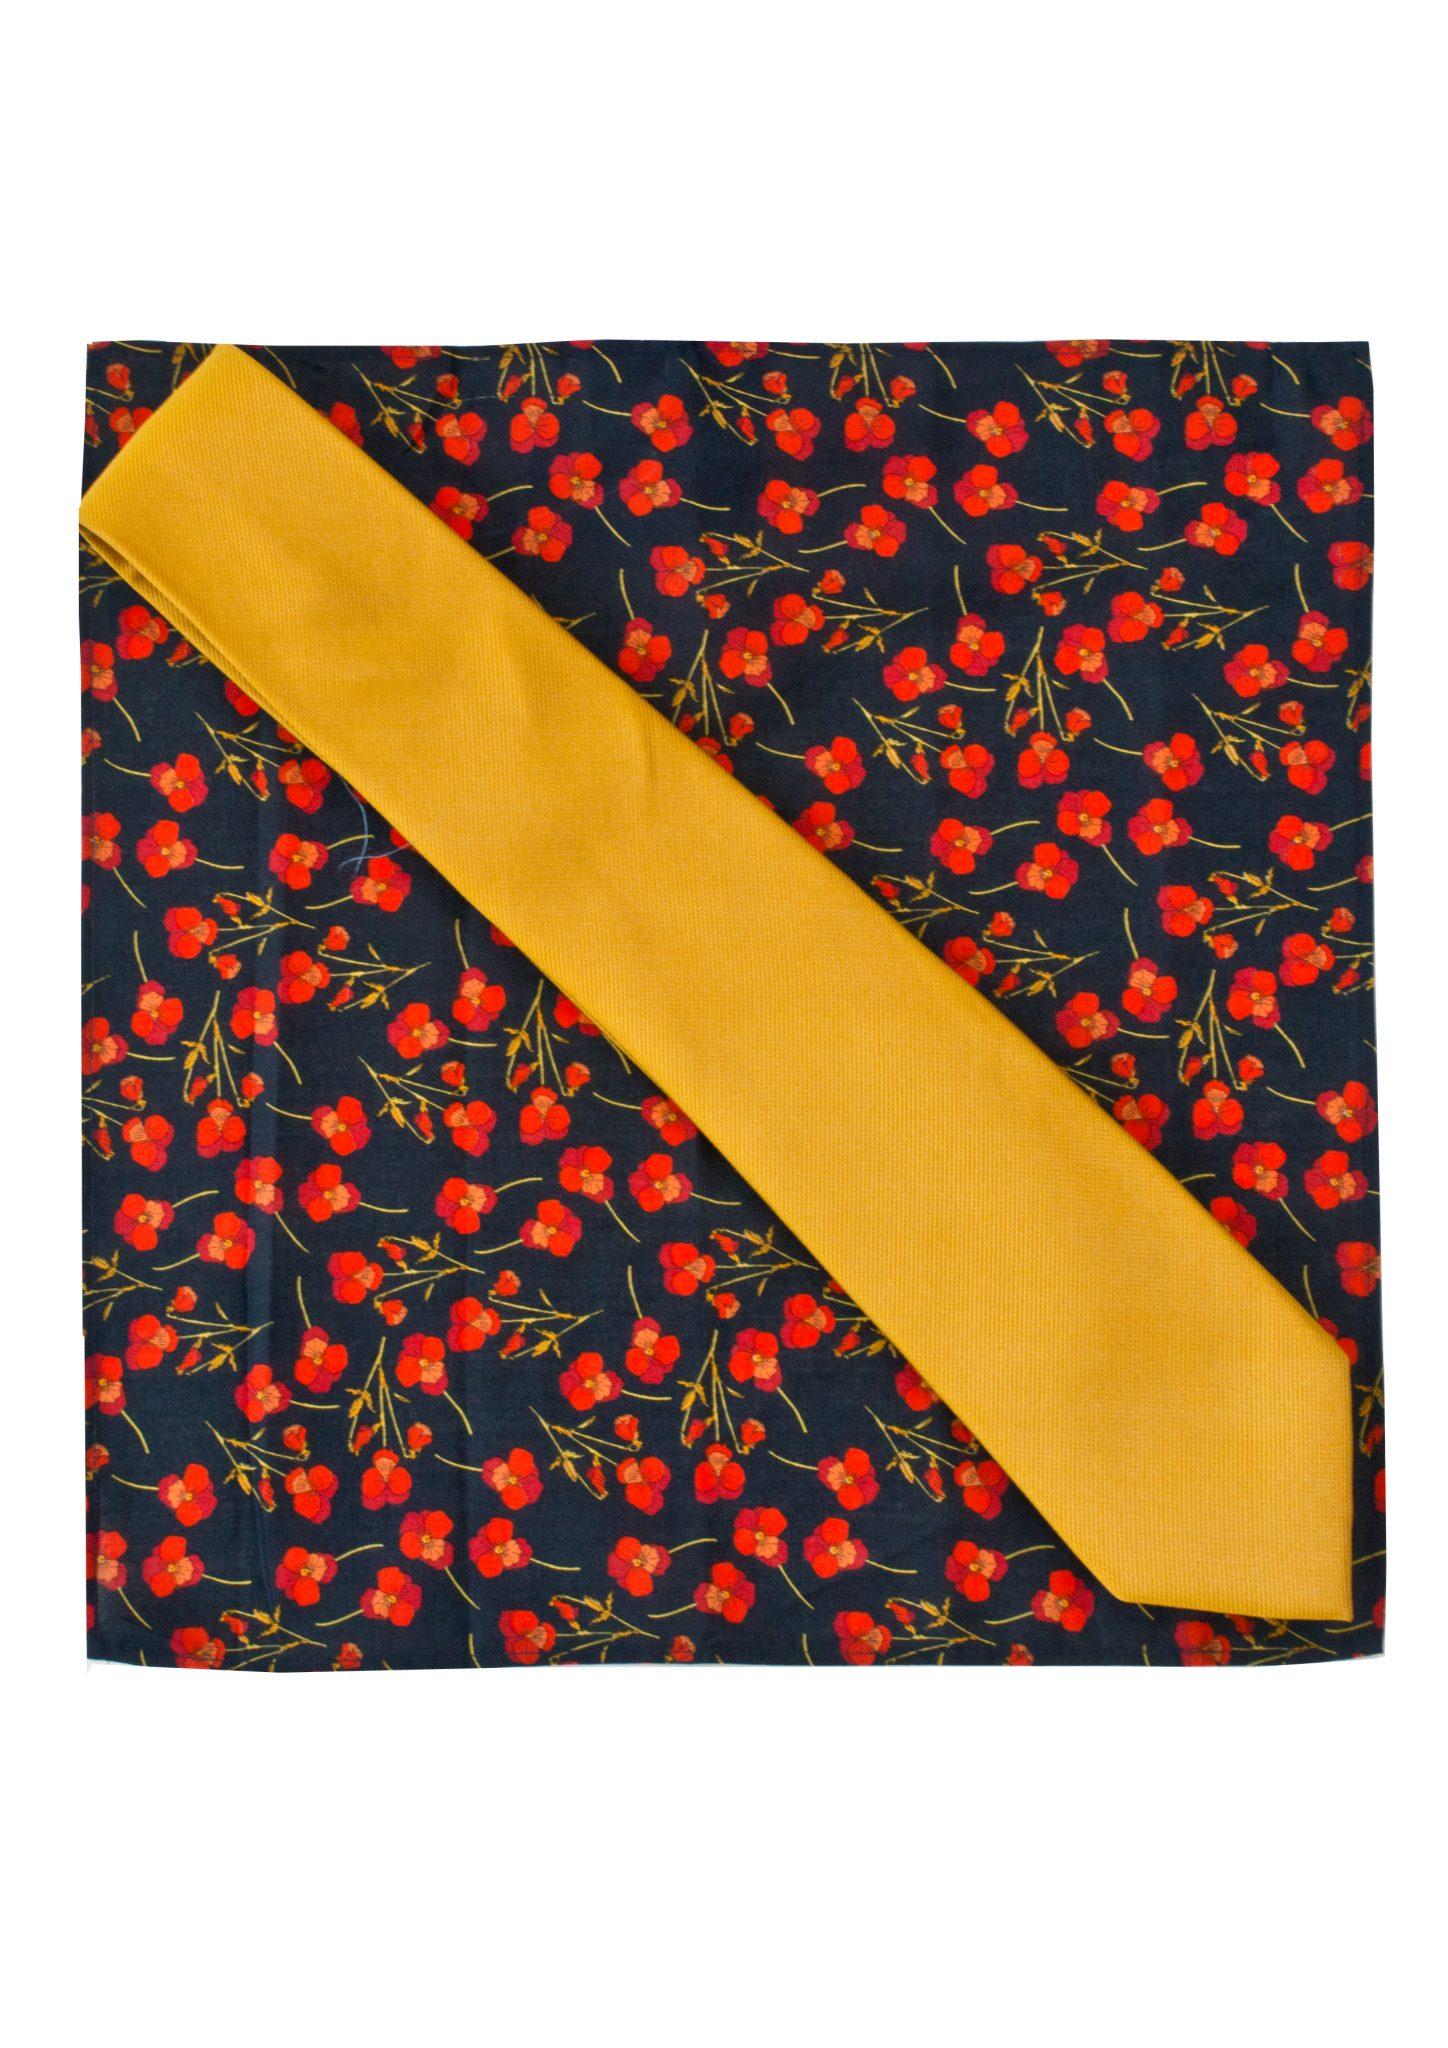 9d94f71d329f Gianni Feraud Liberty Print Ros Pocket Square with Plain Silk Tie – Gianni  Feraud